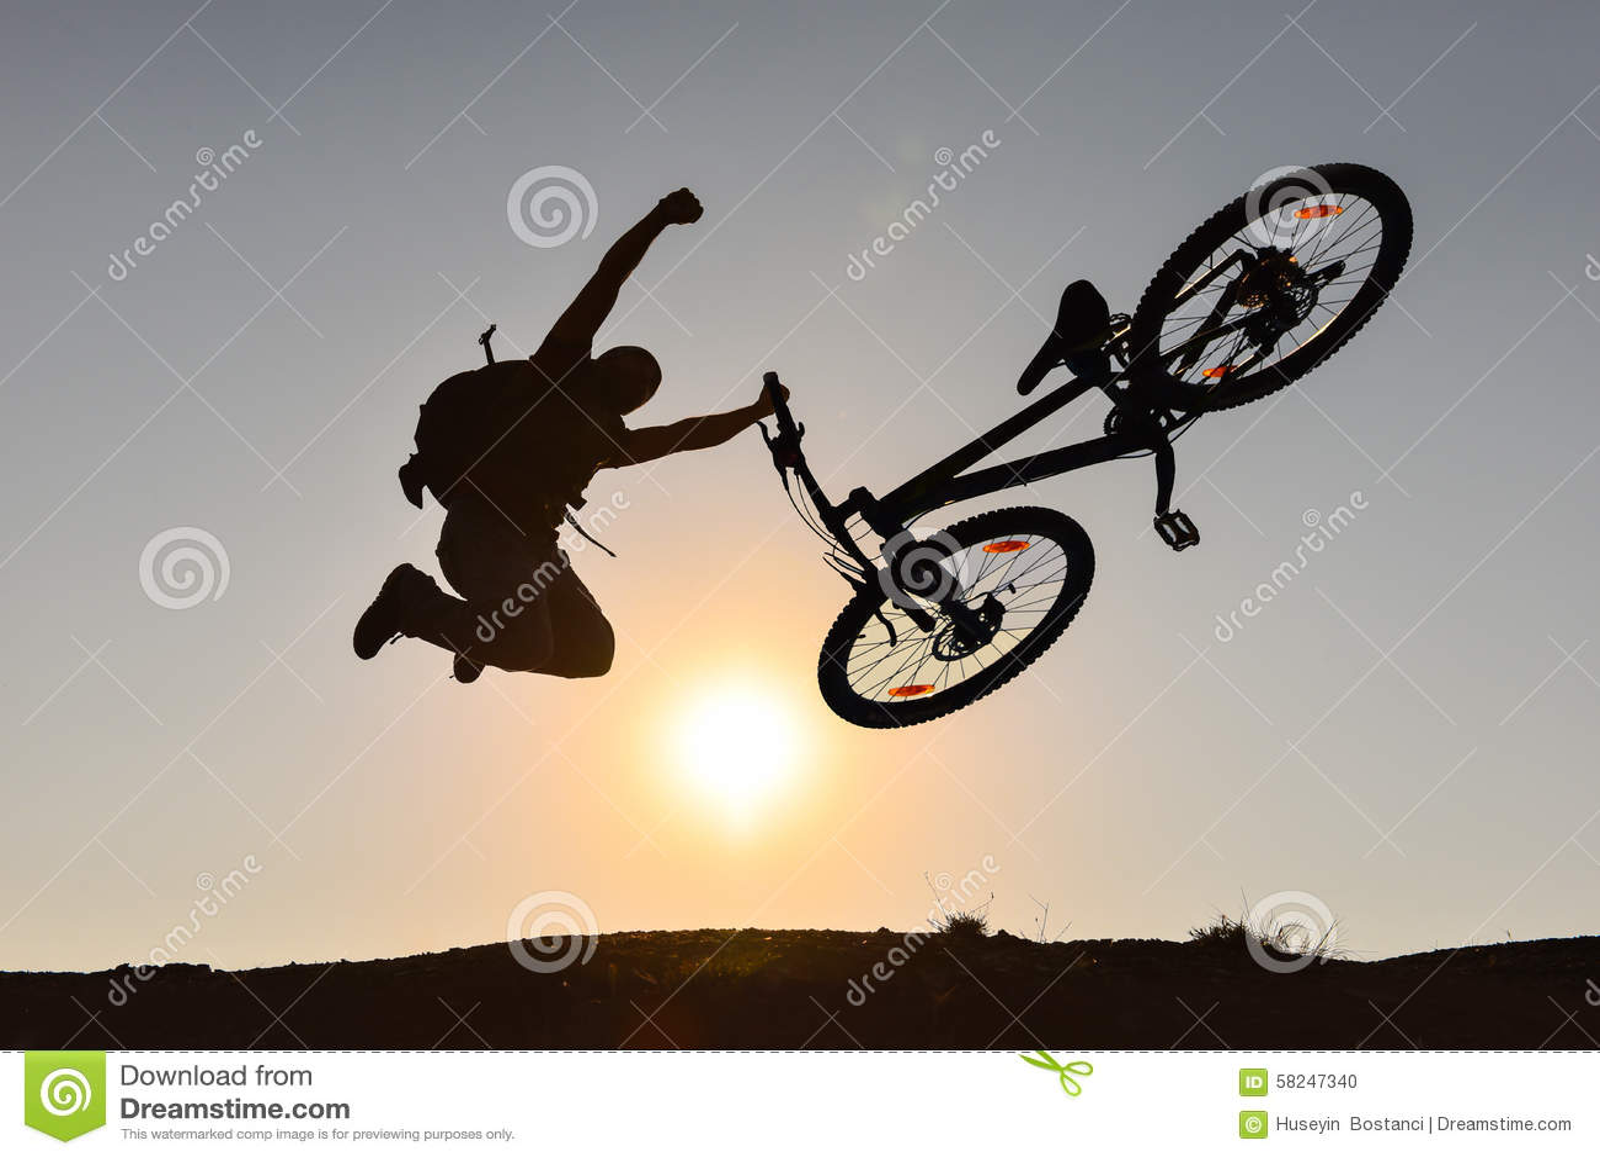 Mountain bike and crazy rider